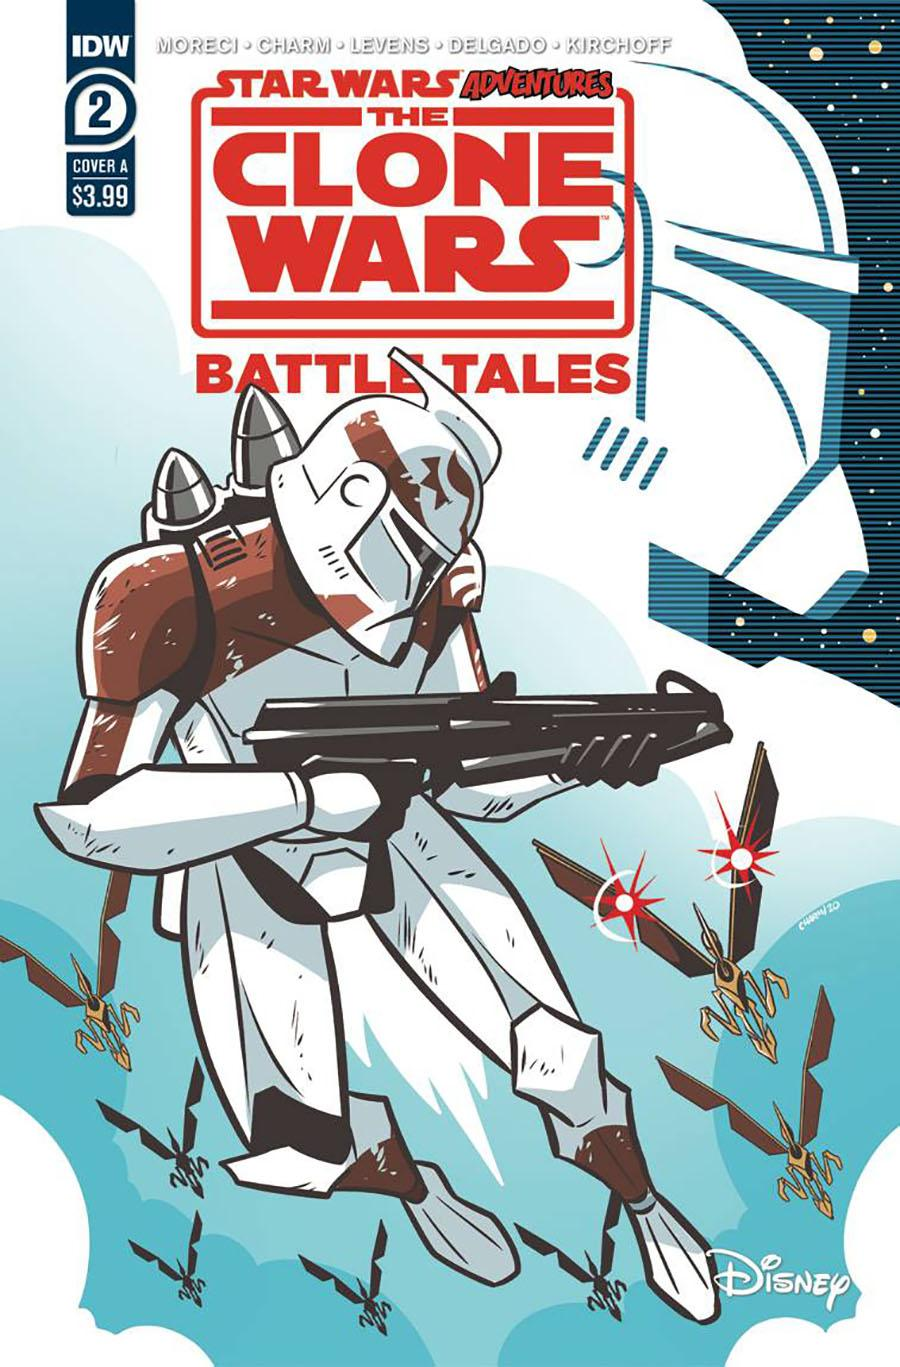 Star Wars Adventures Clone Wars Battle Tales #2 Cover A Regular Derek Charm Cover